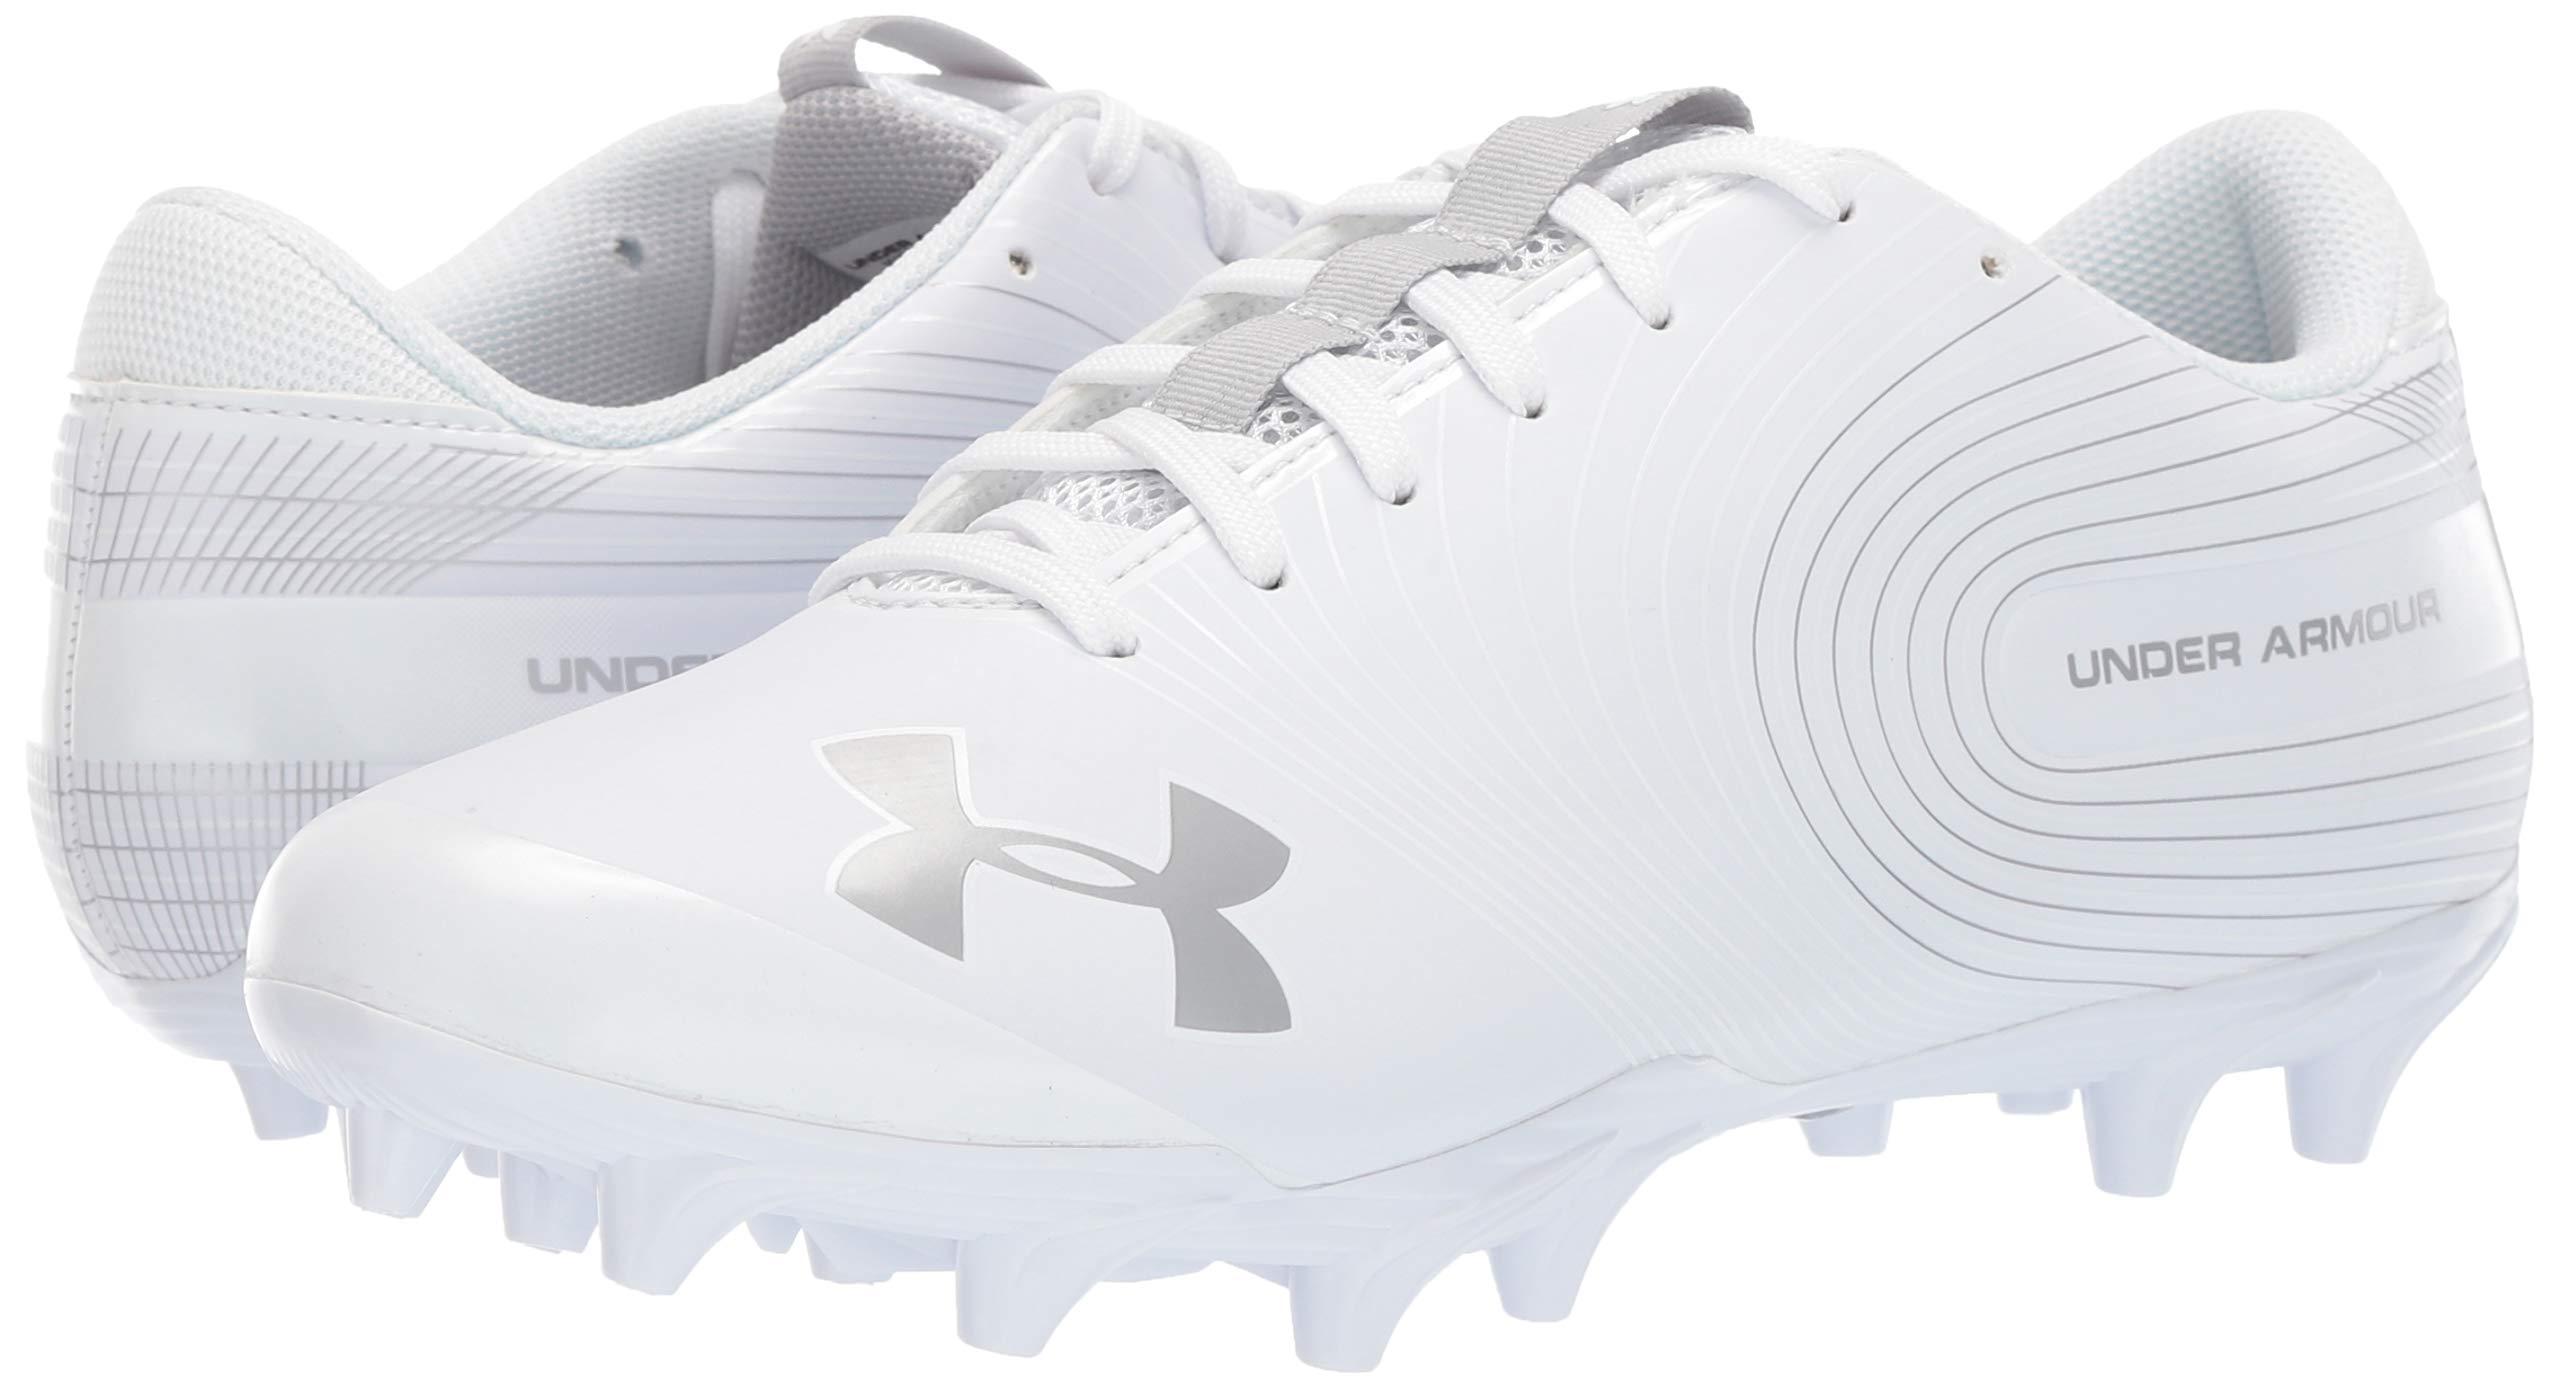 Under Armour Men's Speed Phantom MC Football Shoe, White/White, 7.5 M US by Under Armour (Image #5)